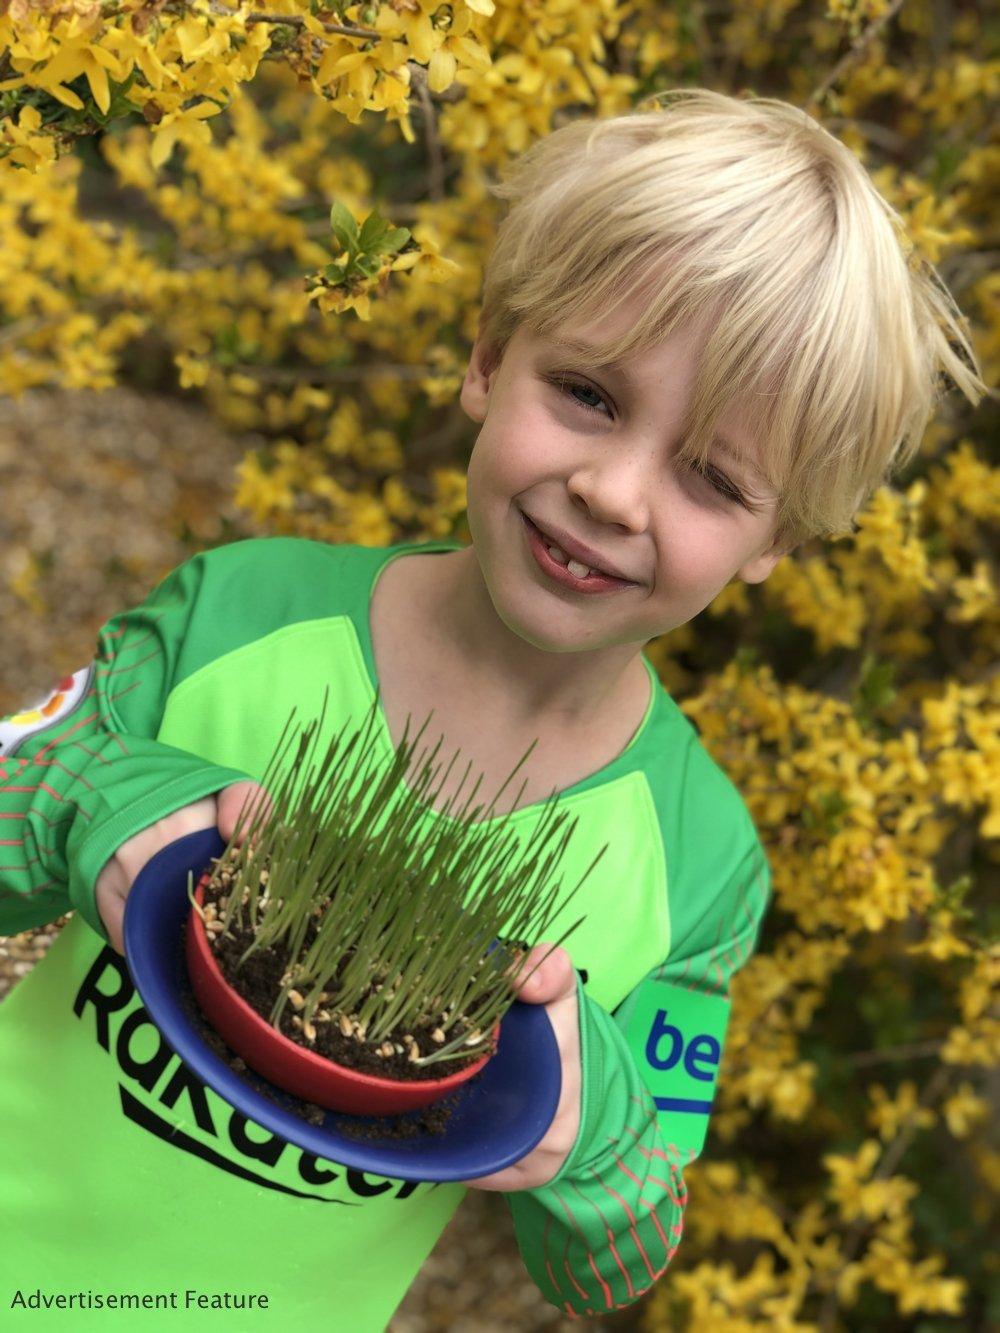 Mud & Bloom kids subscription box - boy holding wheatgrass he's grown